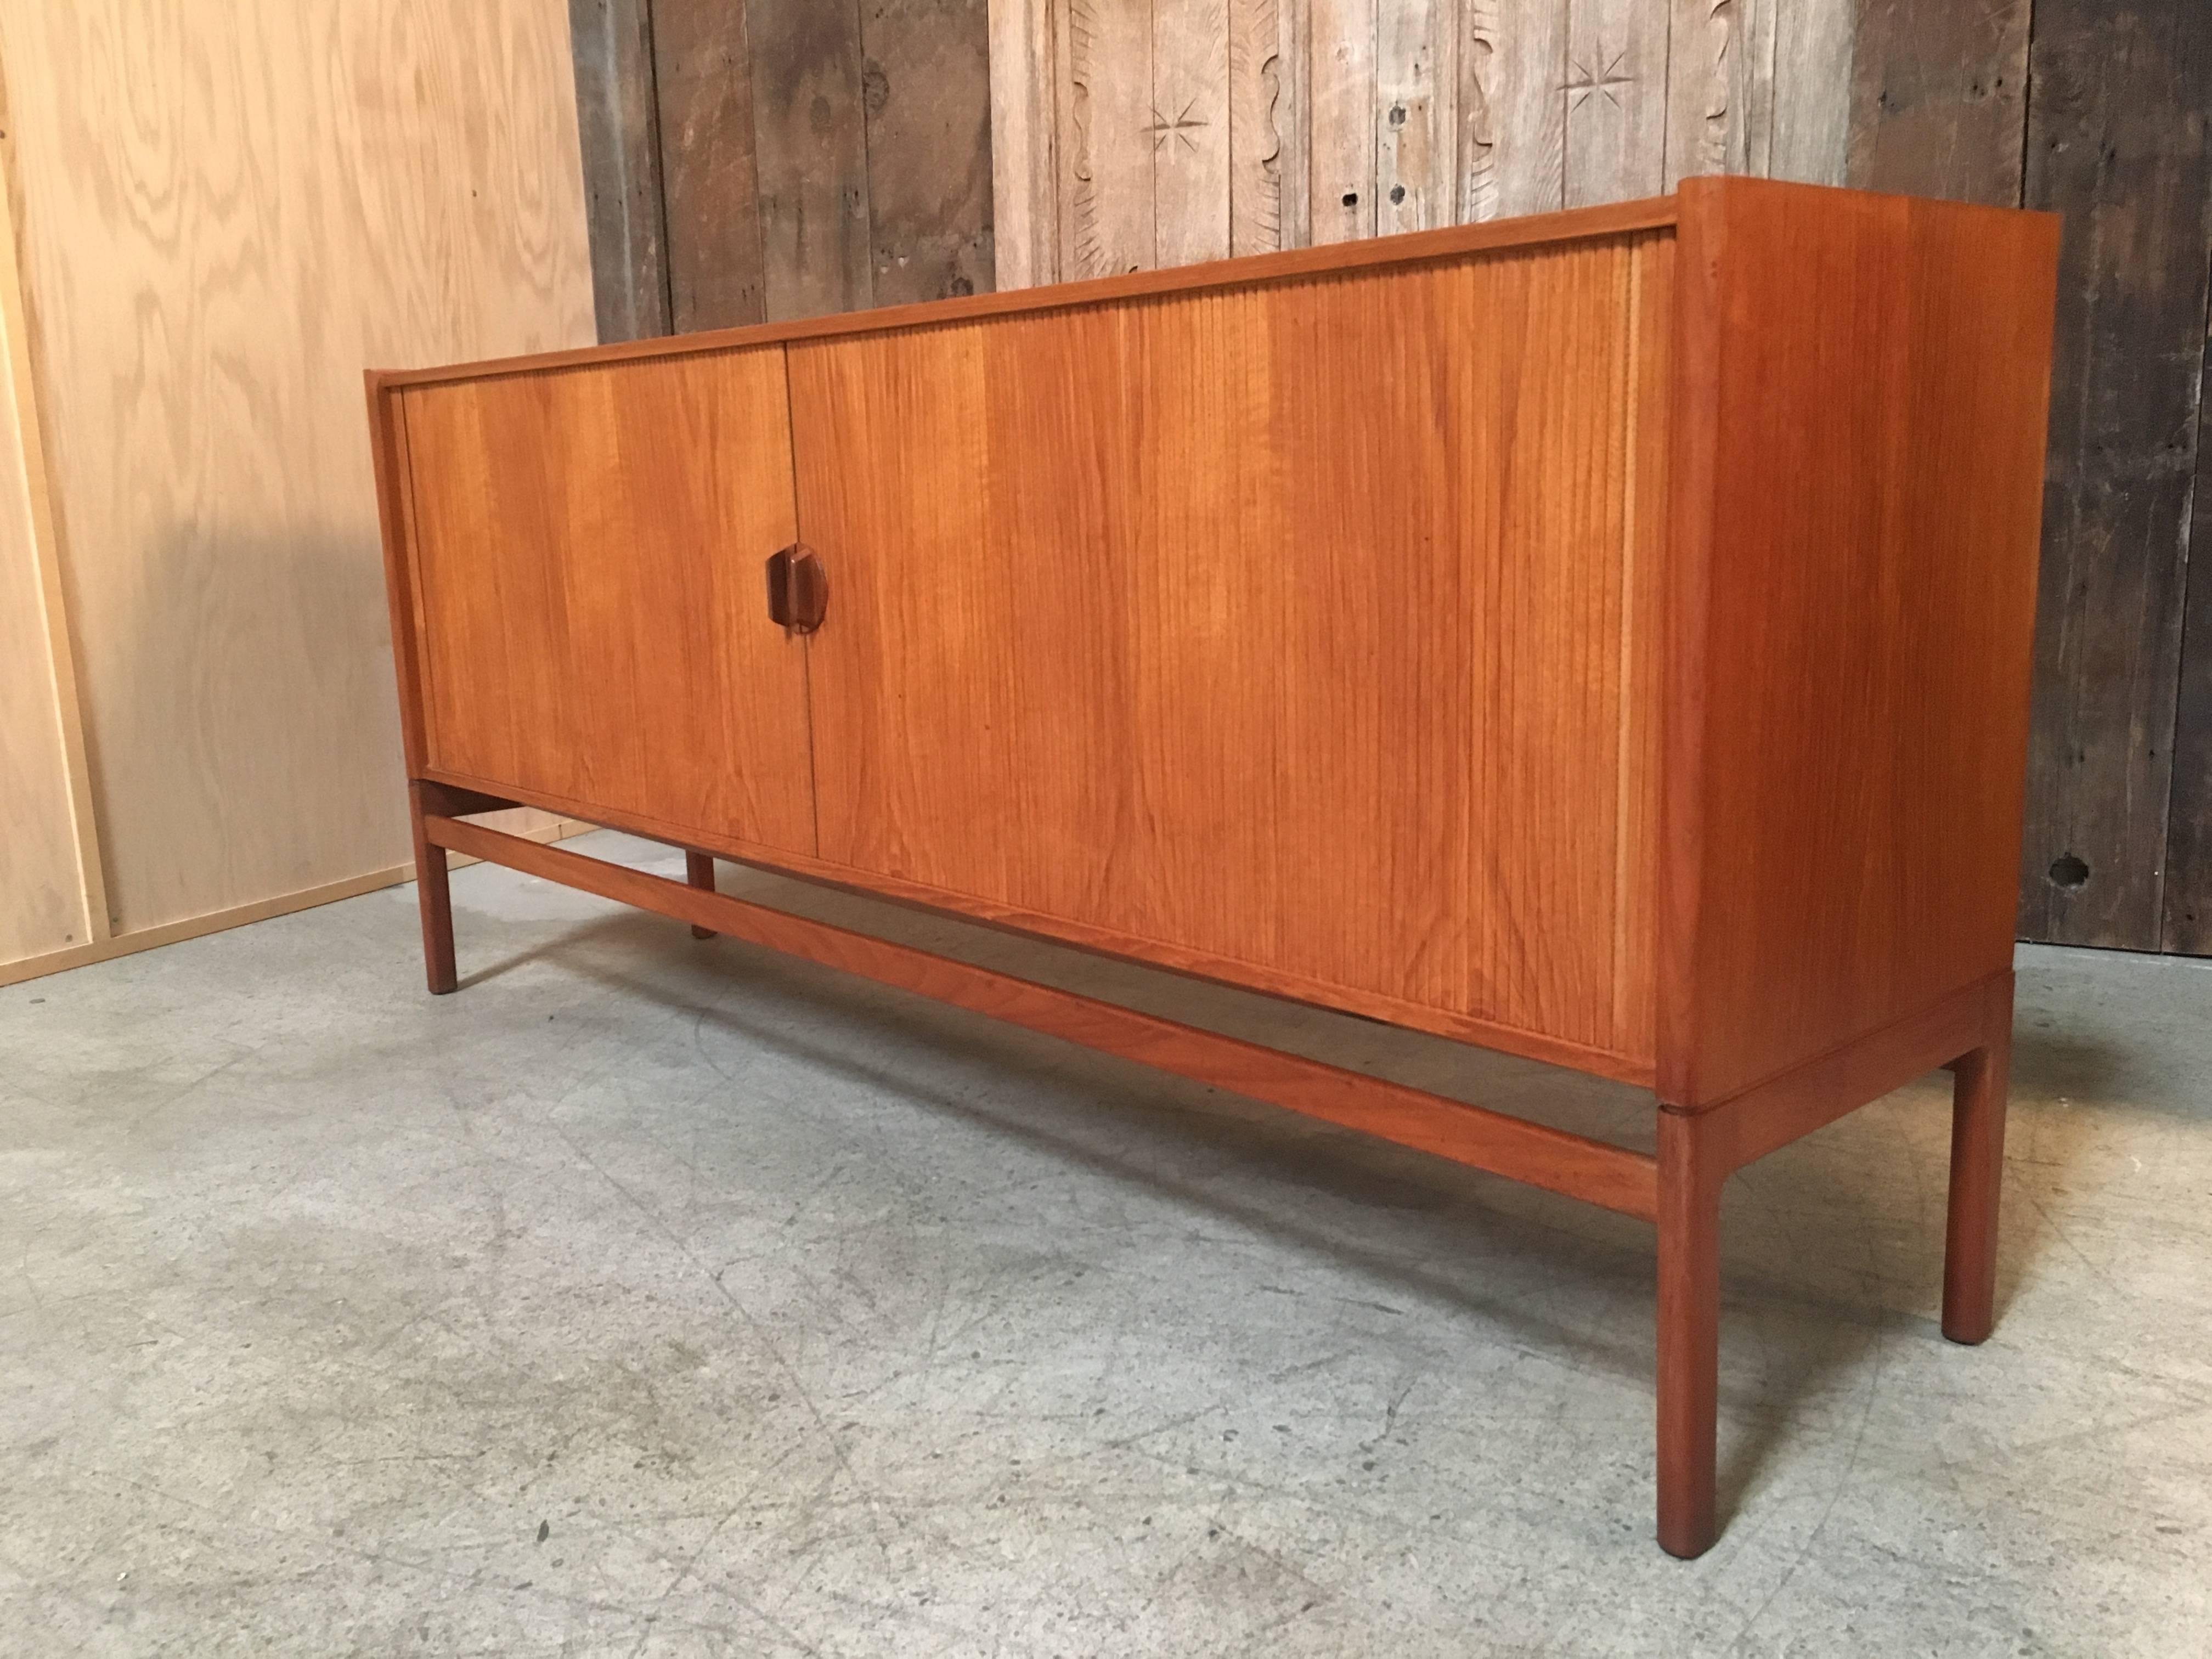 Danish Style Credenza : Vintage mid century danish modern teak credenza sideboard buffet